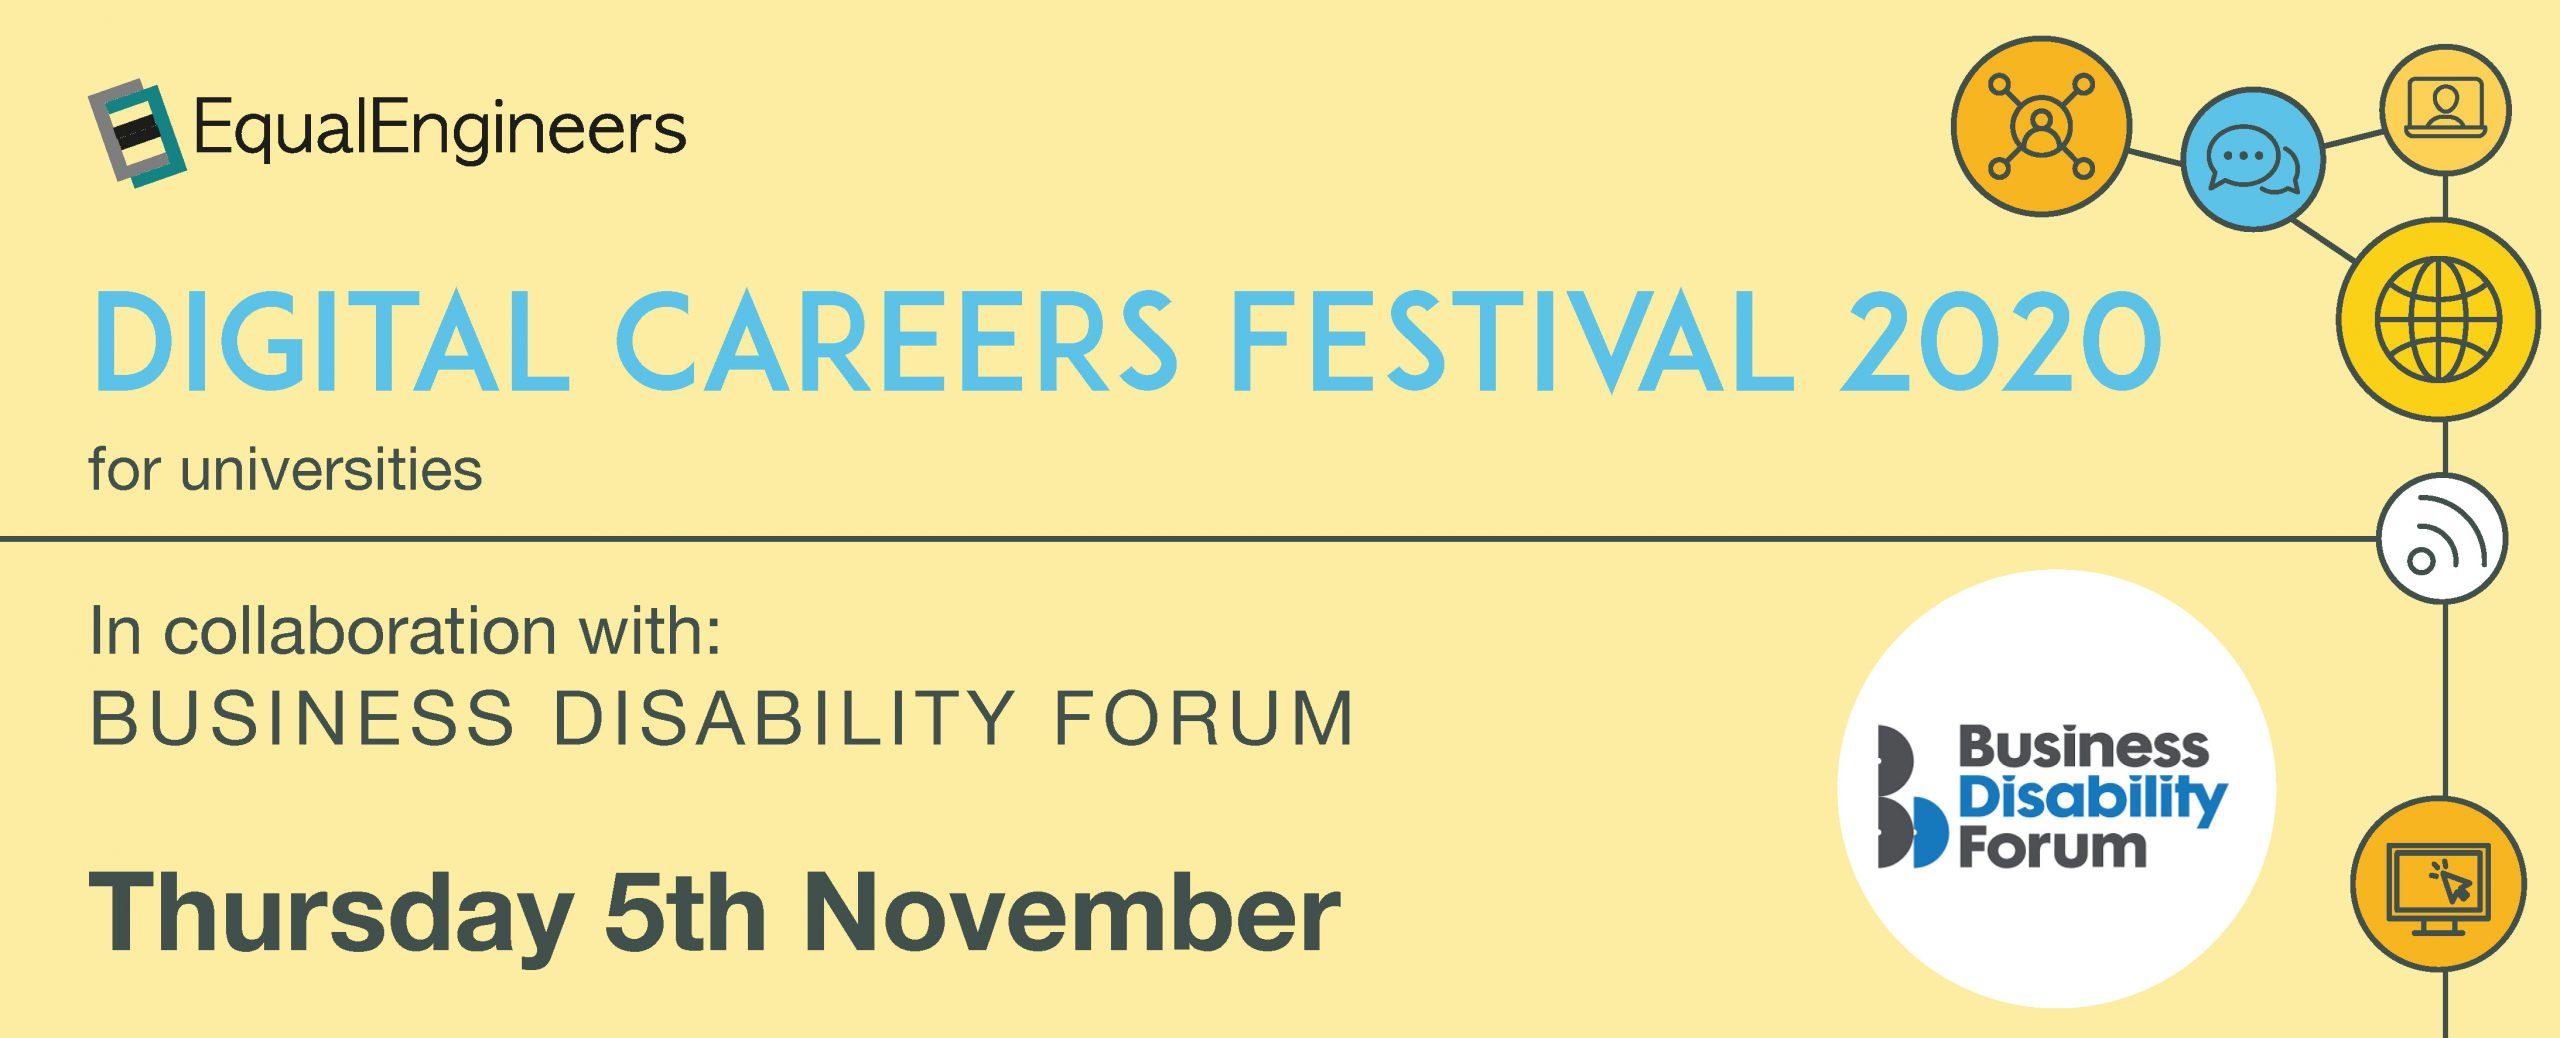 Digital Careers Festival for Universities - 5th November